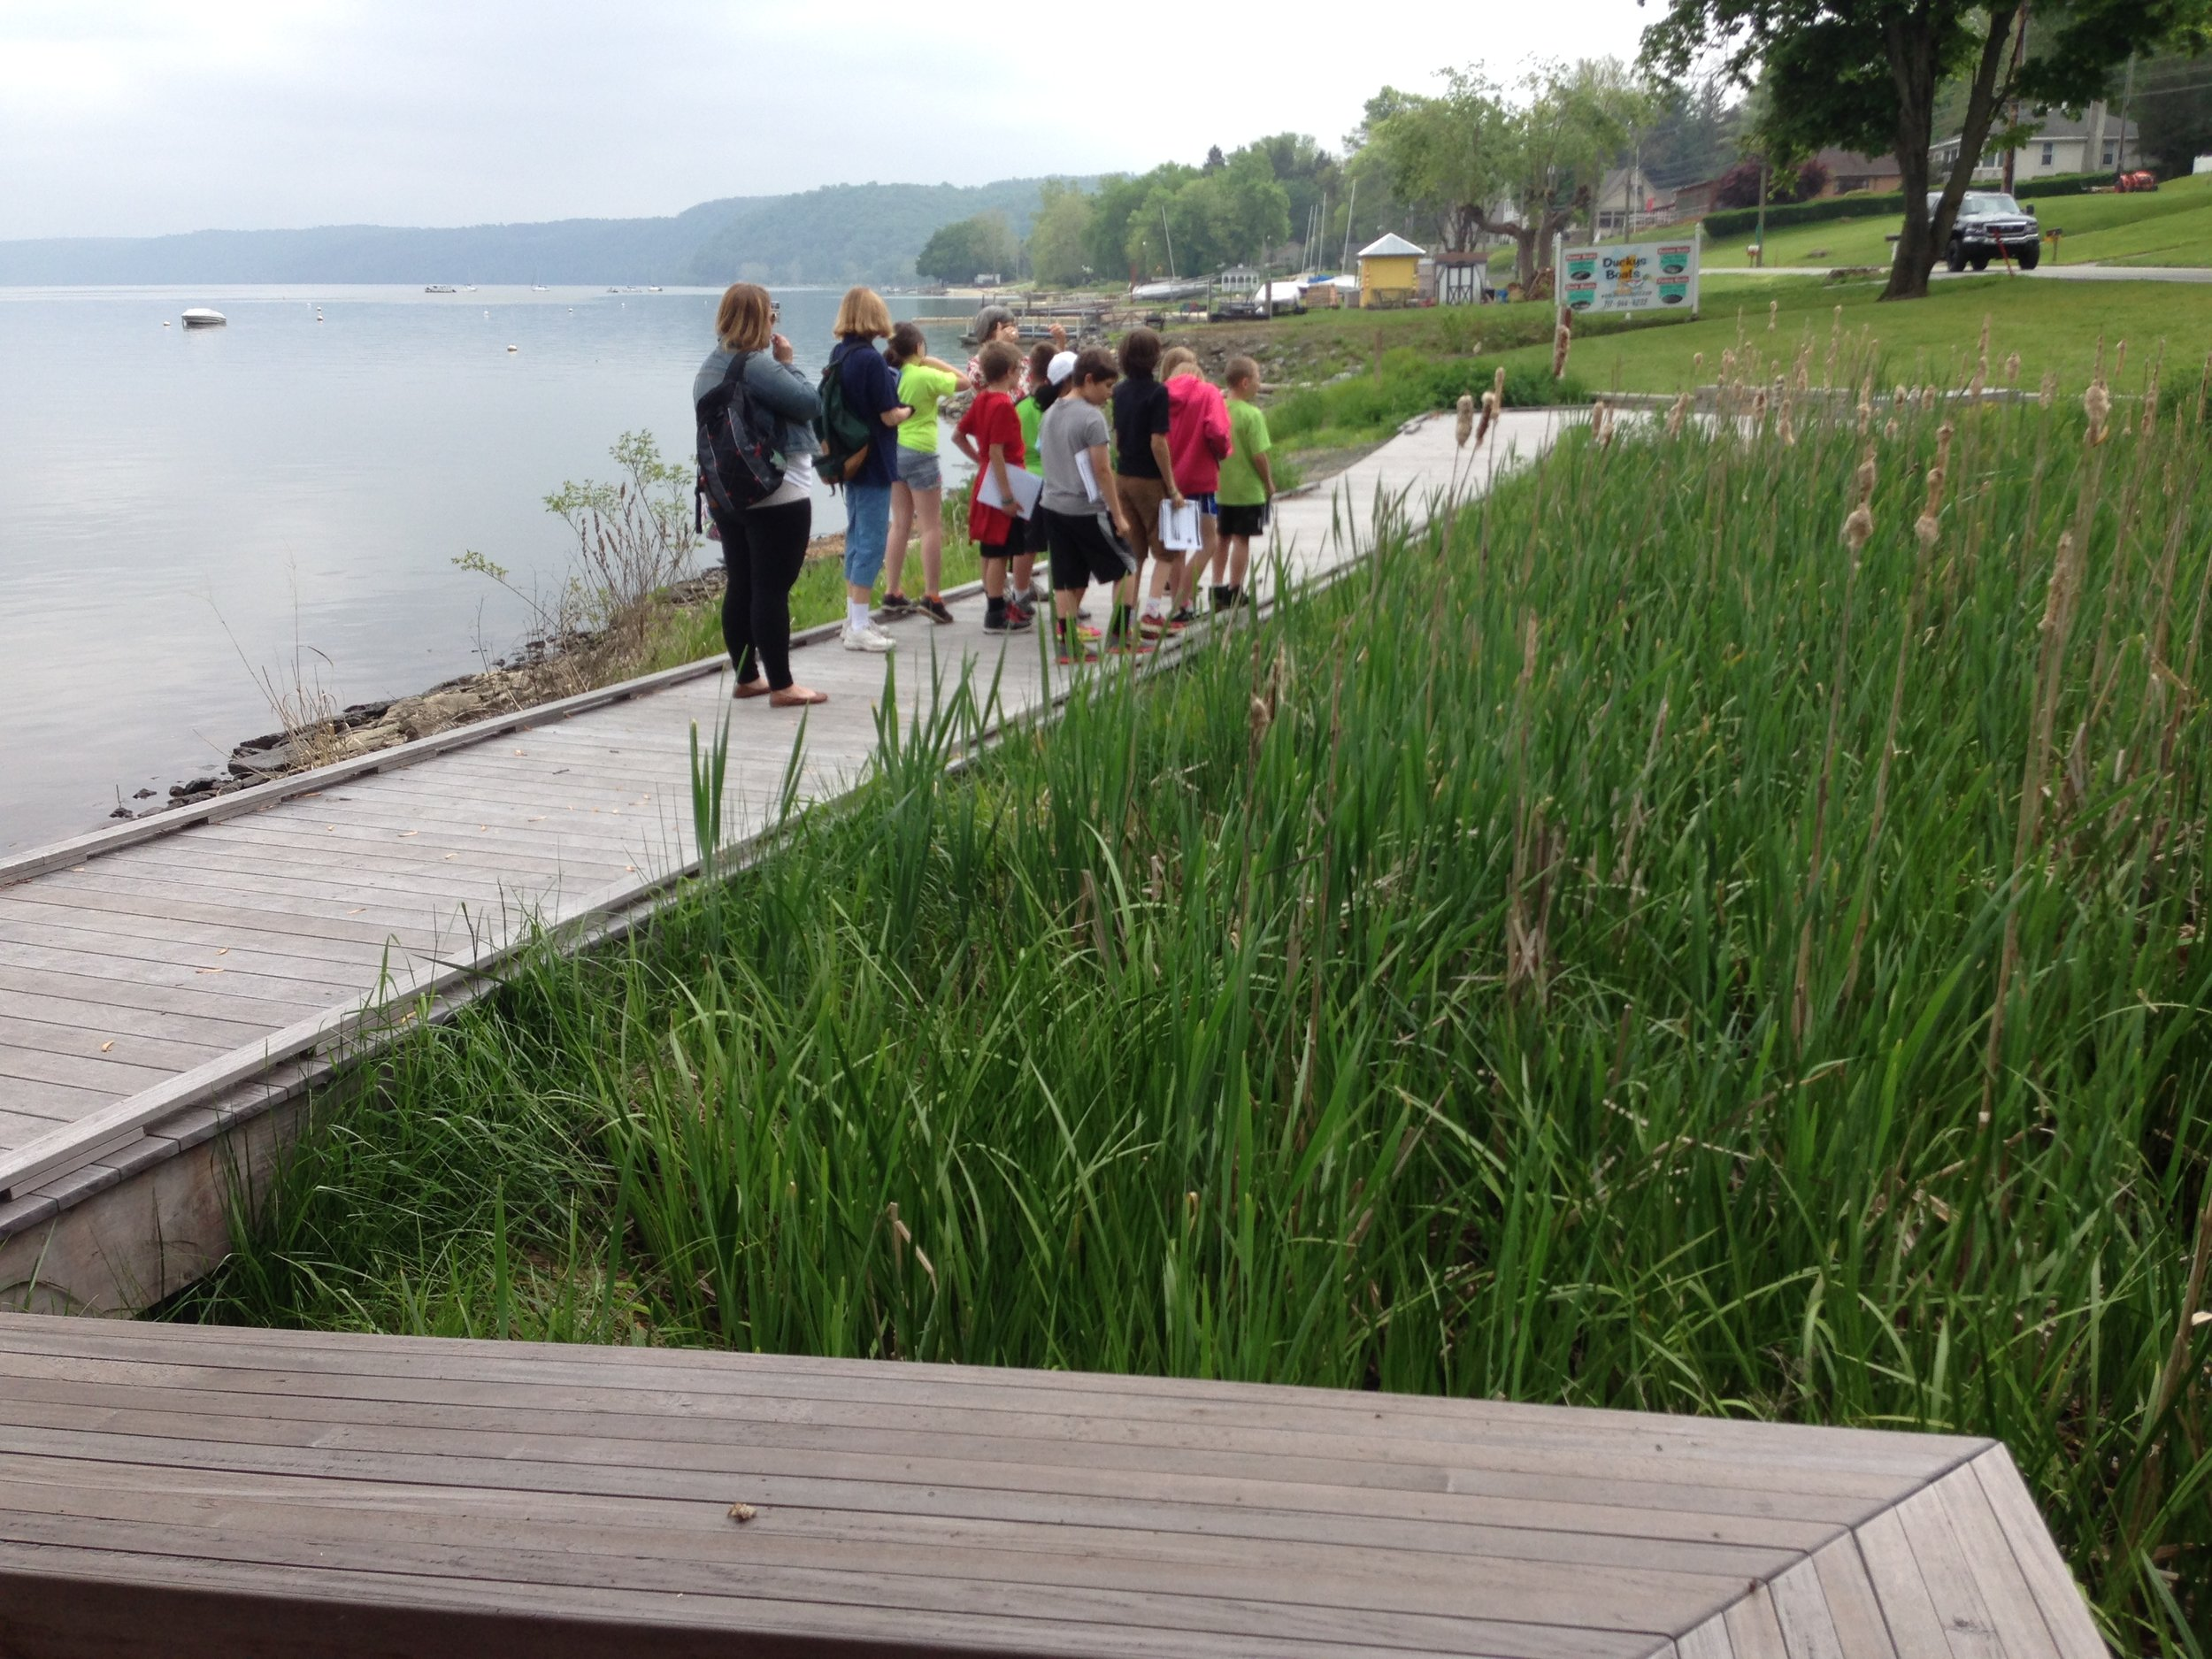 12 Students on Boardwalk at Riverside.jpg